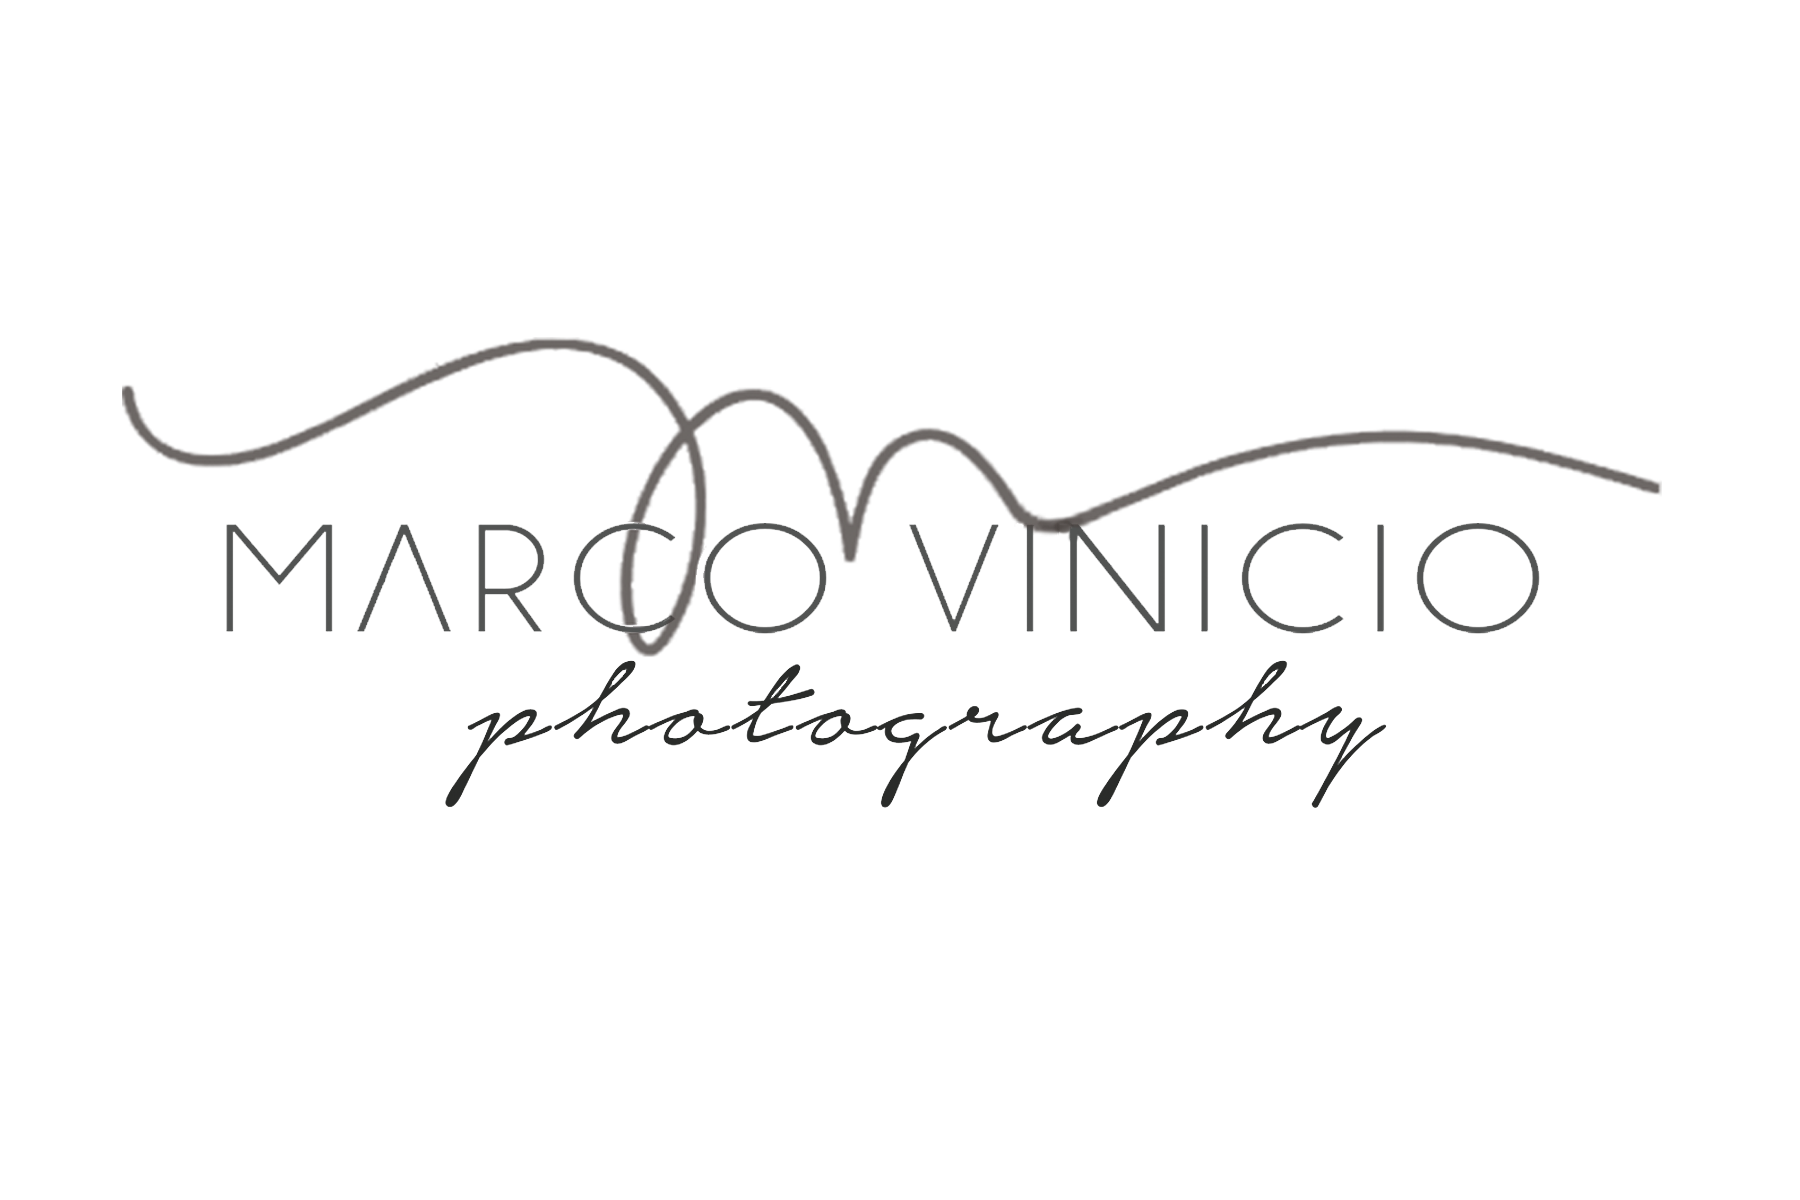 Marco Vinicio Photography